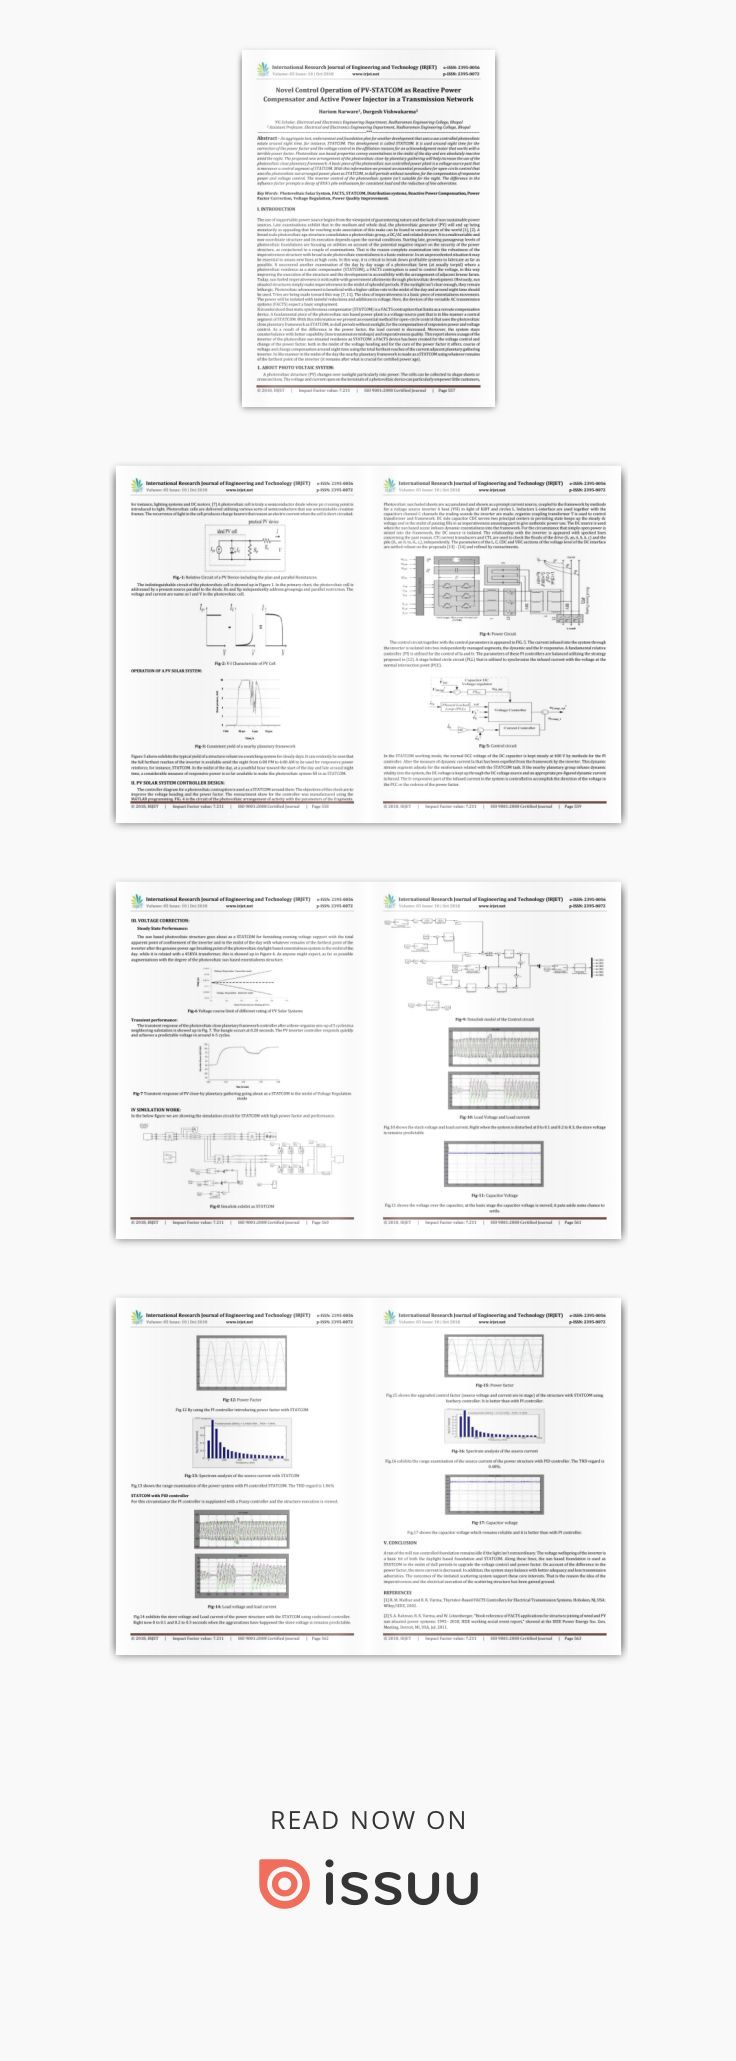 IRJET- Novel Control Operation of PV-STATCOM as Reactive